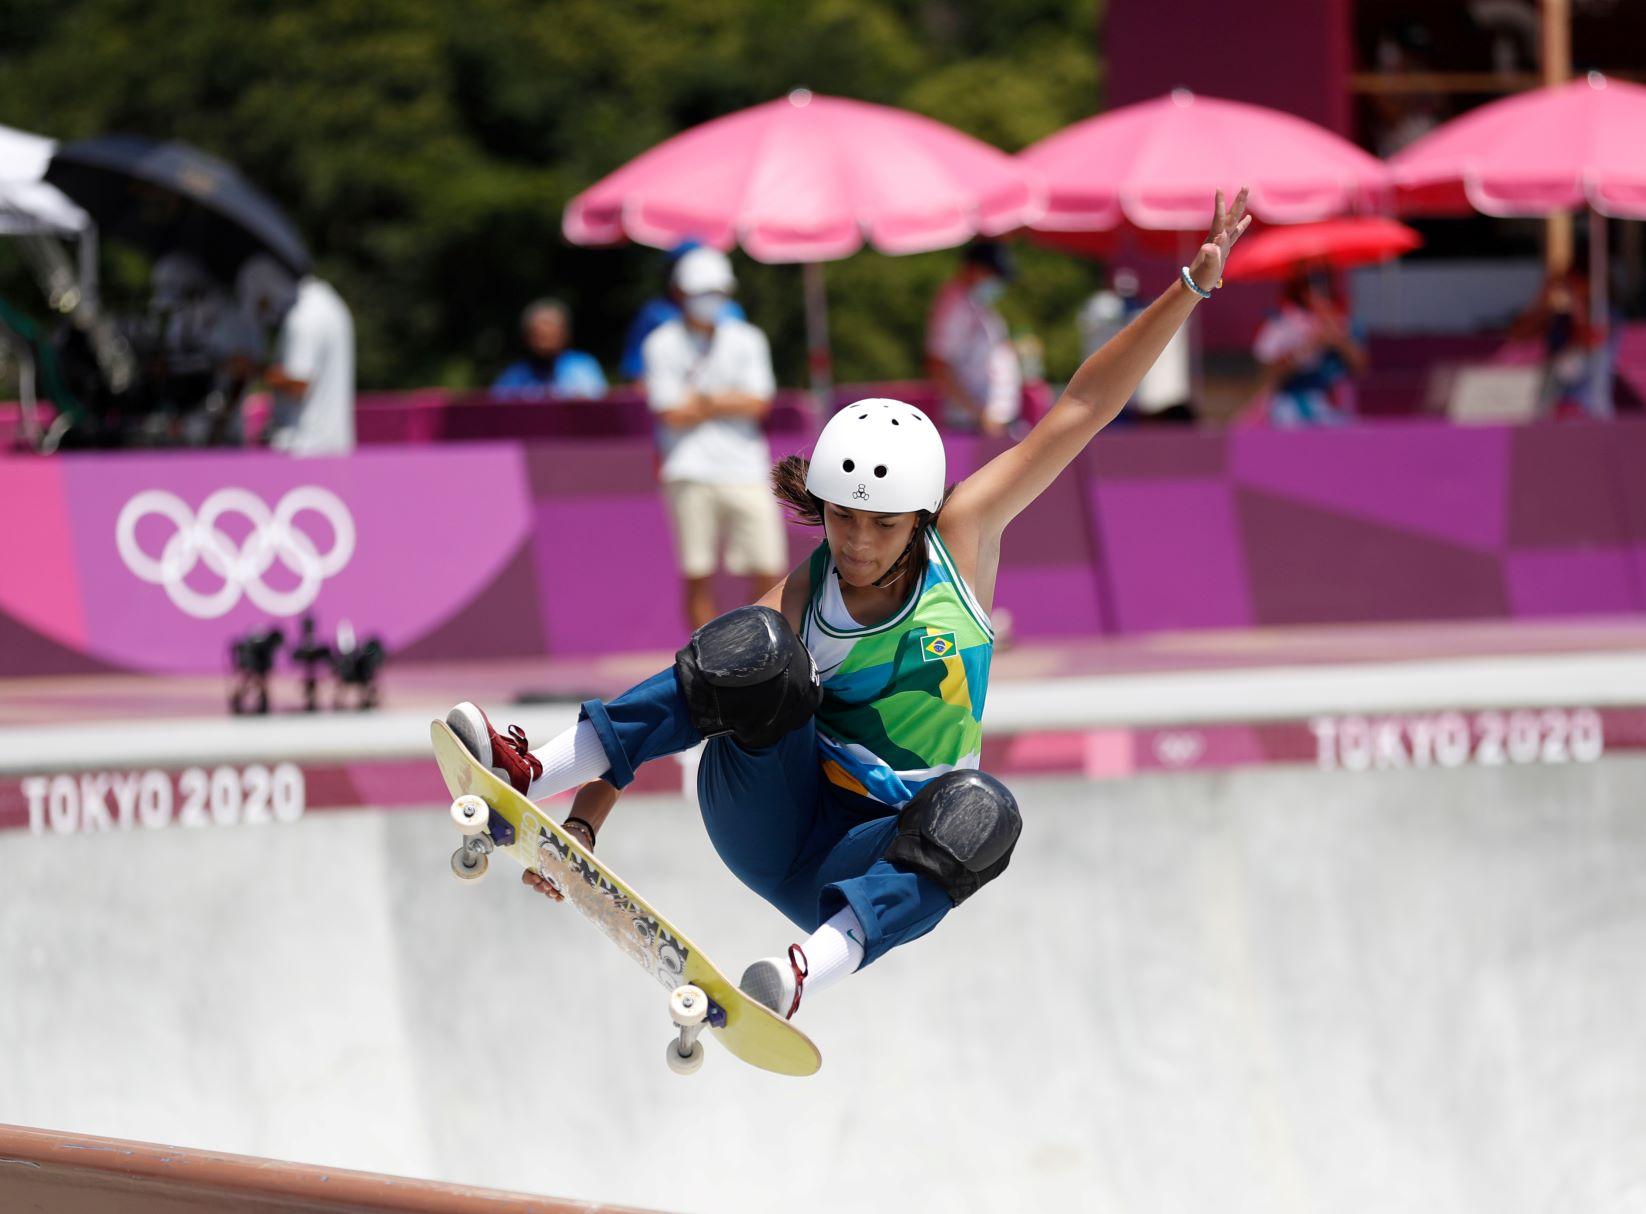 Olympic Medallist skateboarder Rayssa Leal